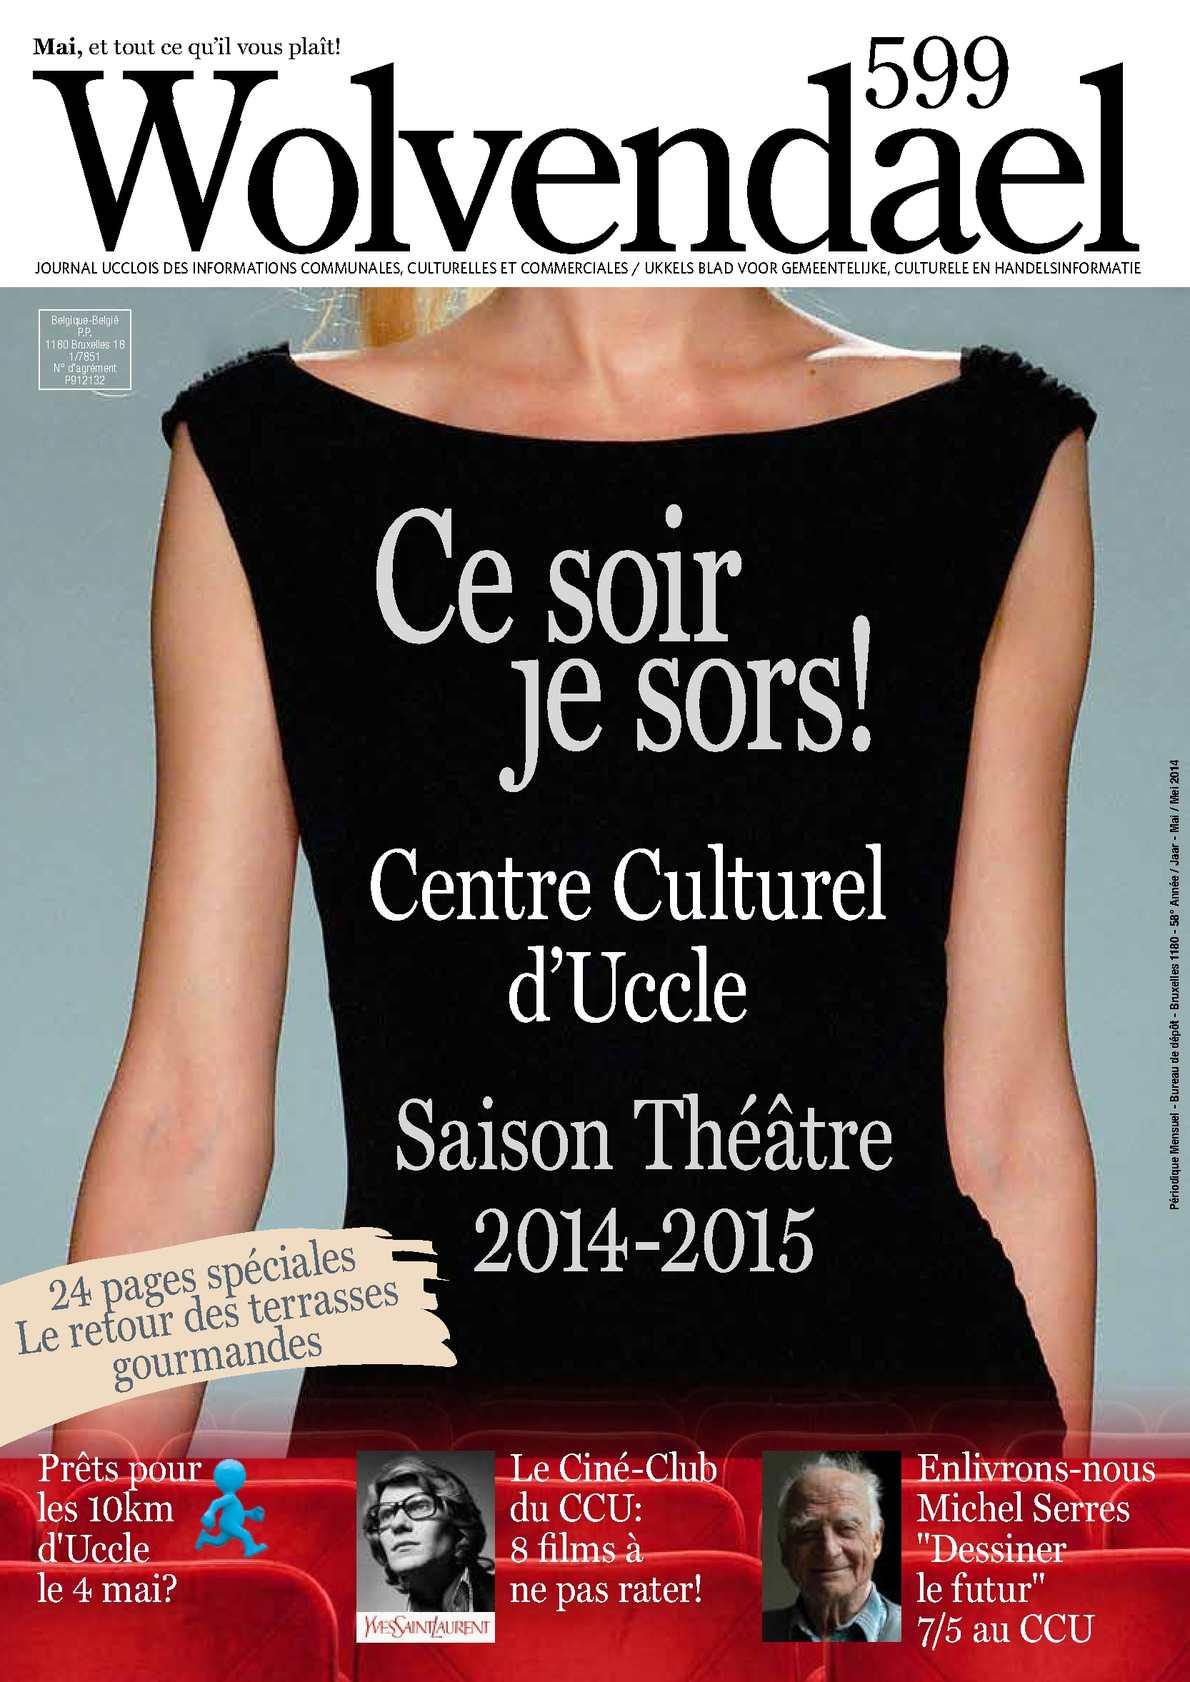 Calaméo - Wolvendael magazine n° 599 mai 2014 ebbaf43da9ac